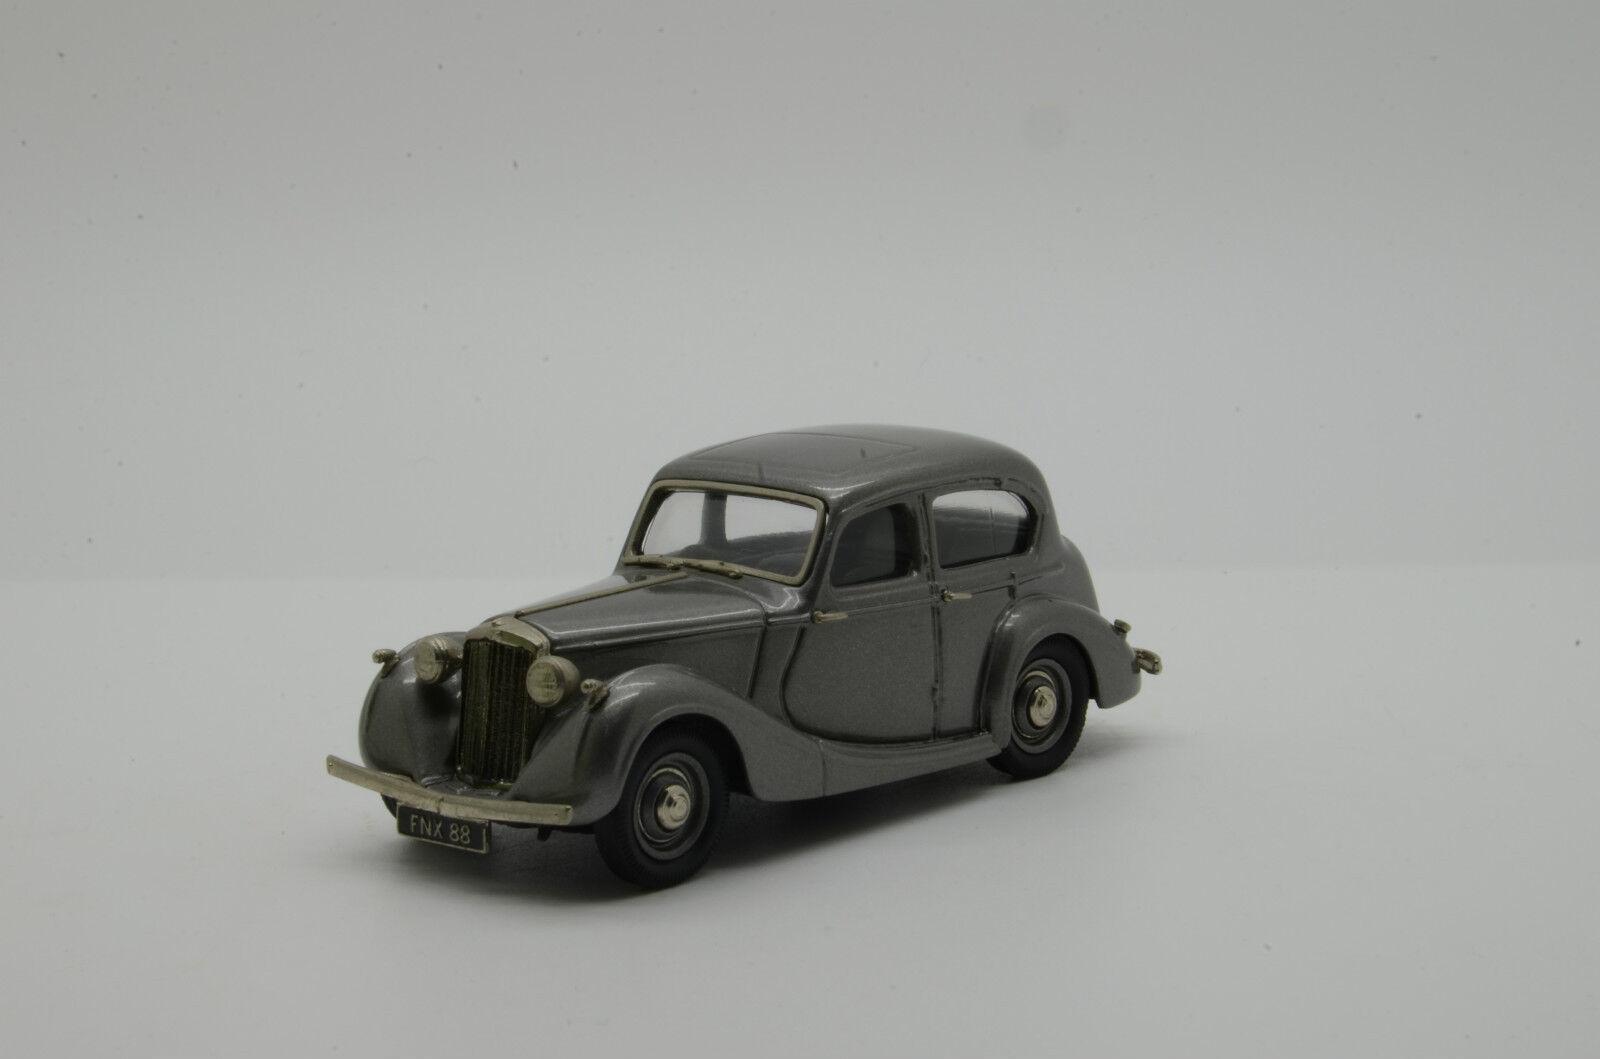 precio mas barato Raro  Sunbeam-Talbot diez diez diez 1945 Lansdowne Ldm. 46 por Brooklin 1 43  estilo clásico